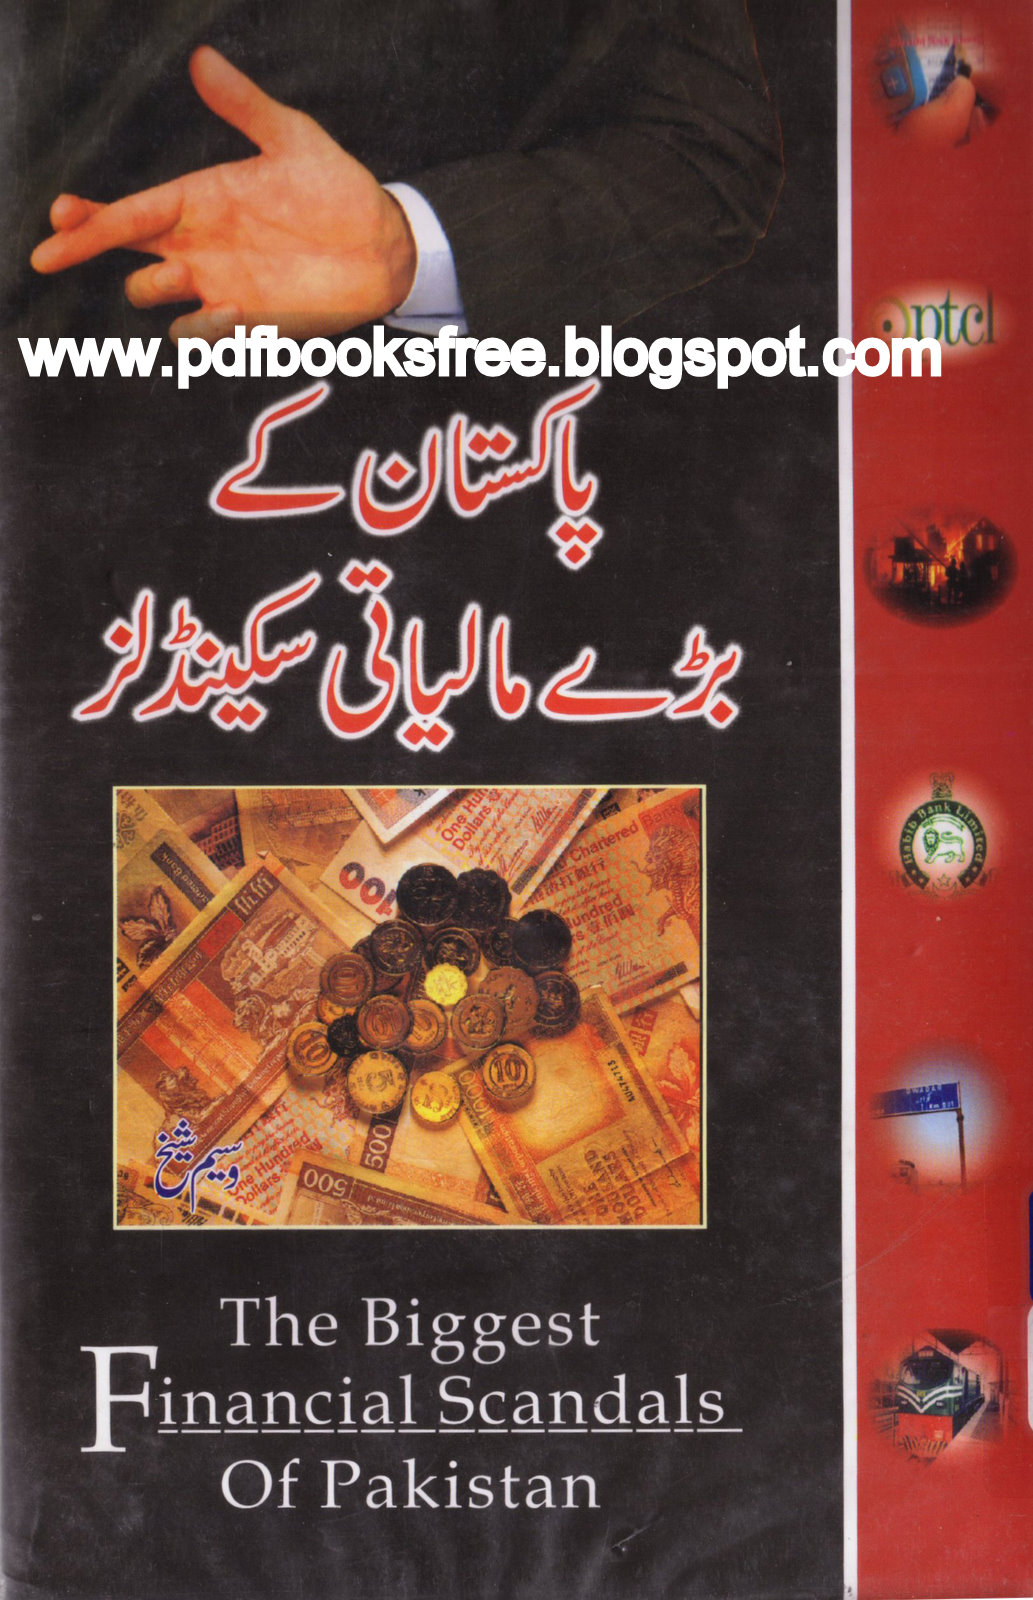 The Biggest Financial Scandals of Pakistan in Urdu pdf ...